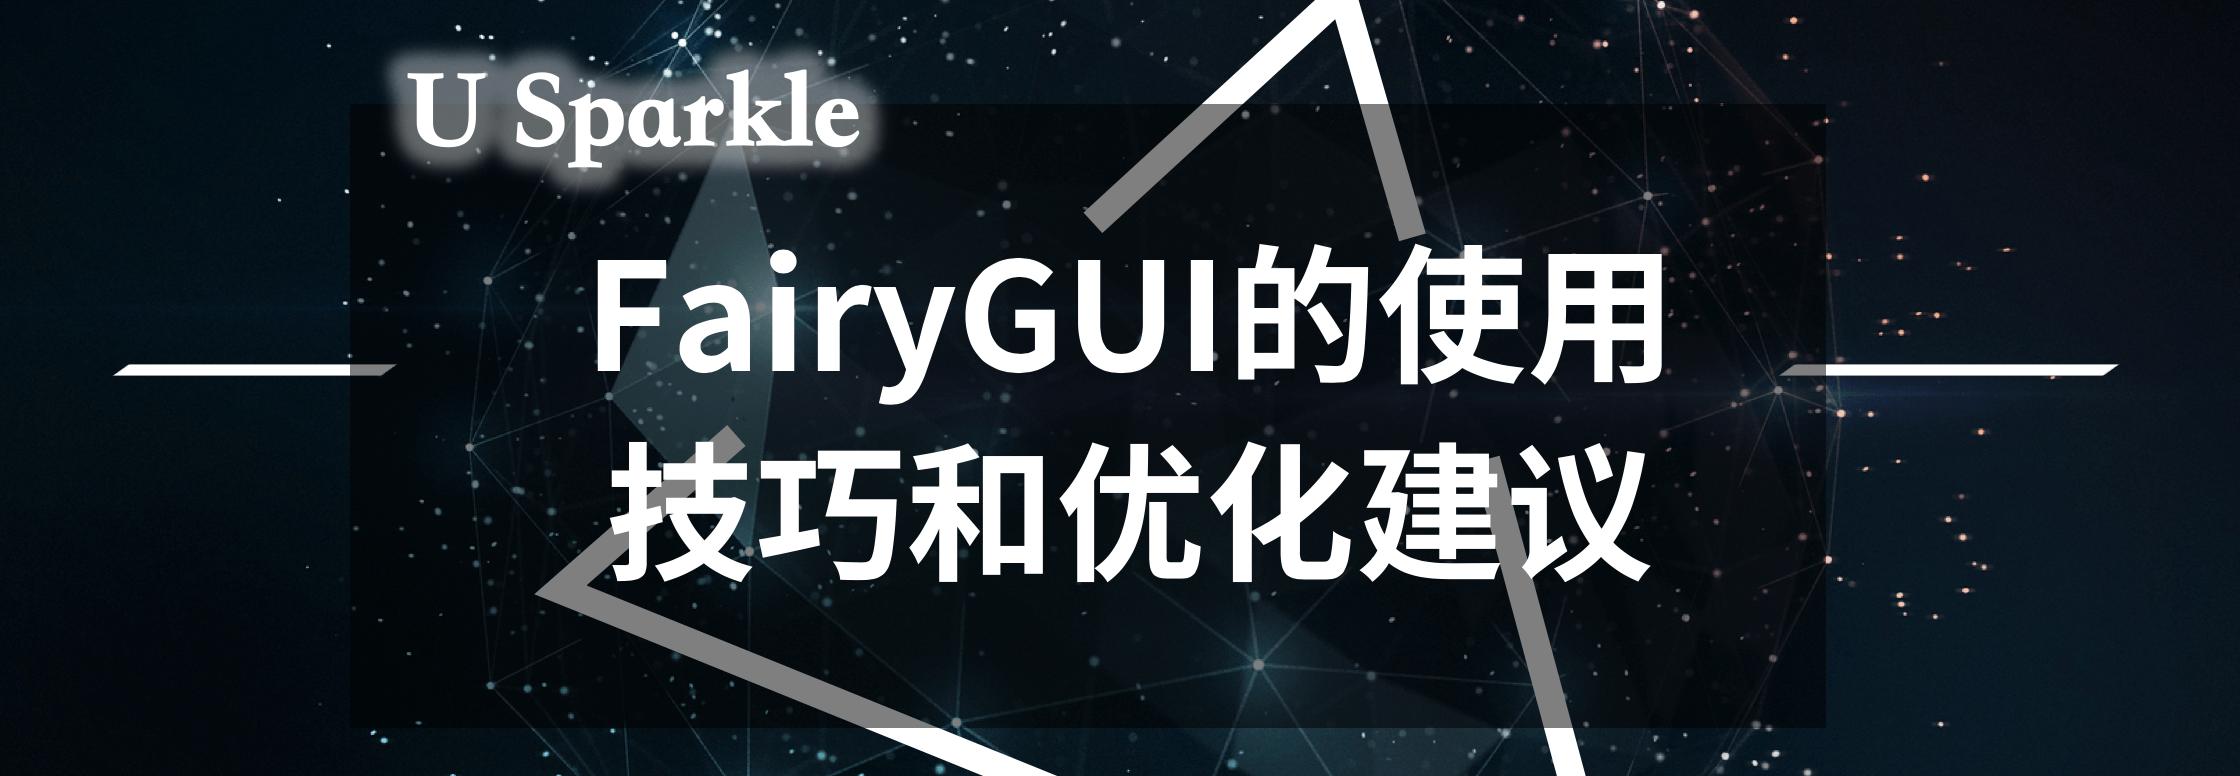 FairyGUI的使用技巧和优化建议